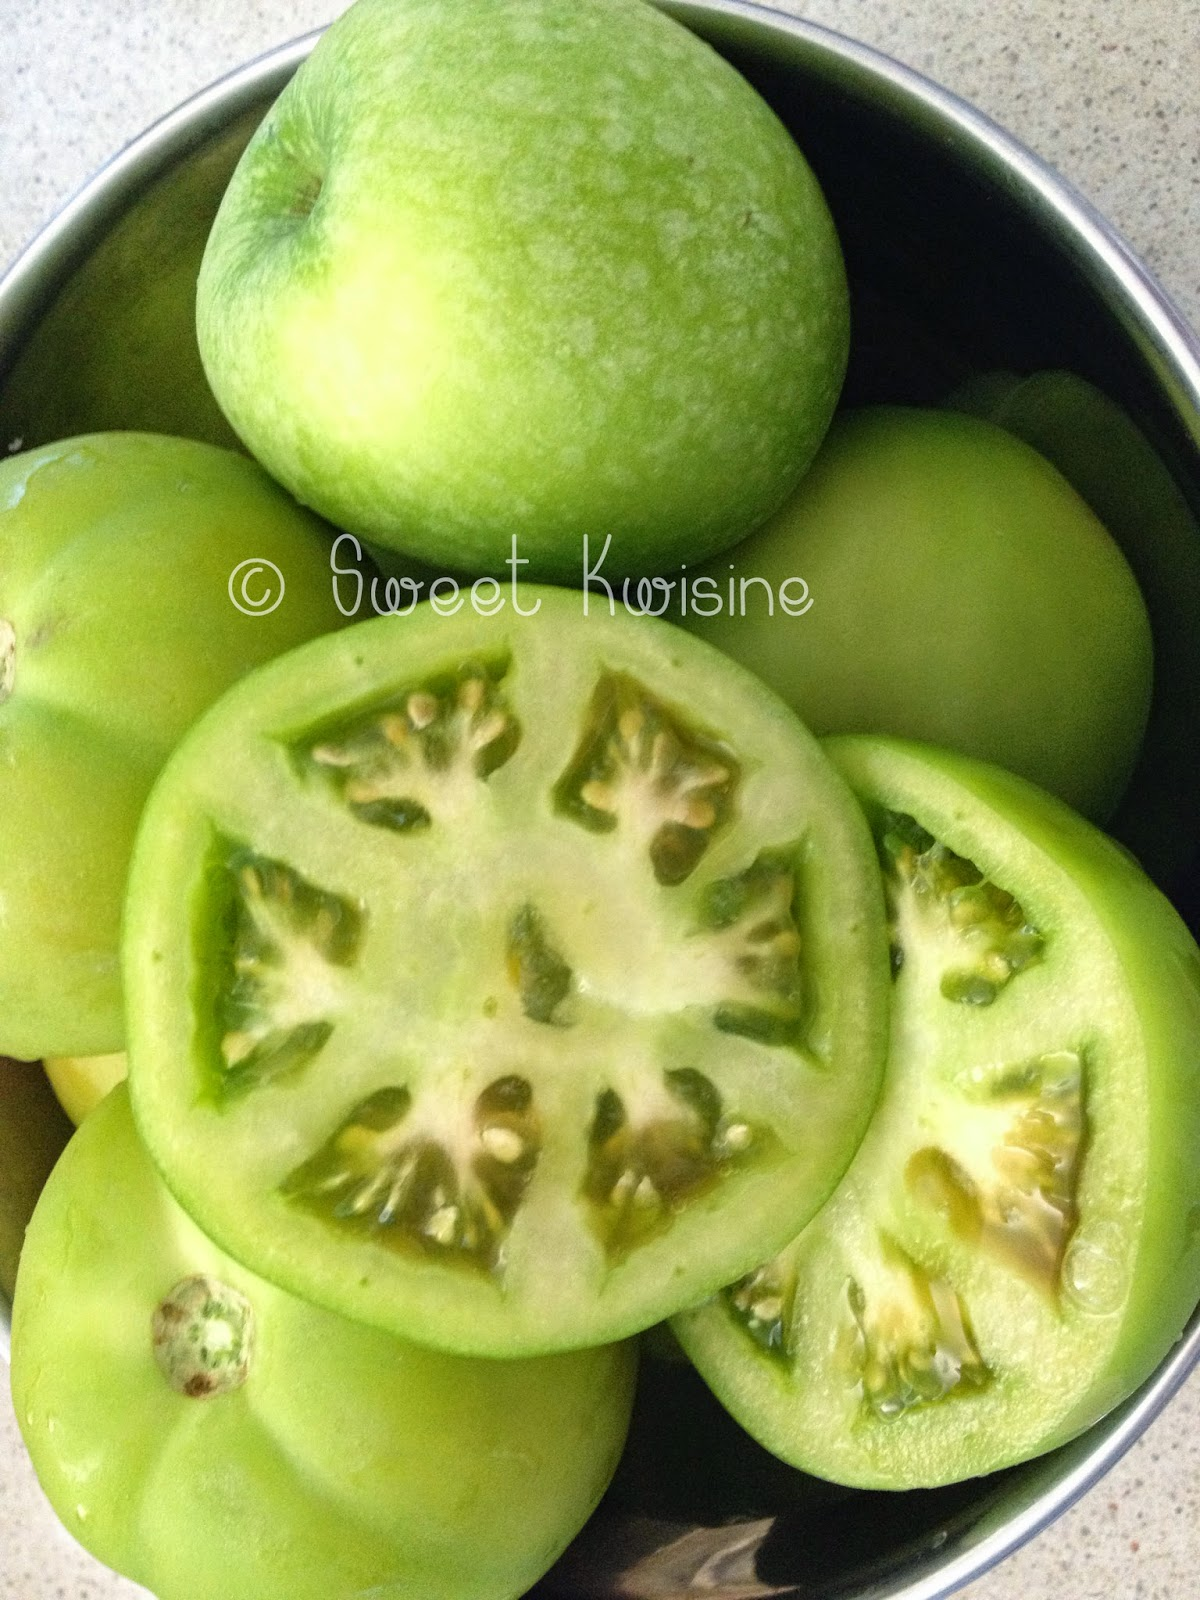 sweet kwisine, tomate, verte, confiture, vanille, légumes moches,